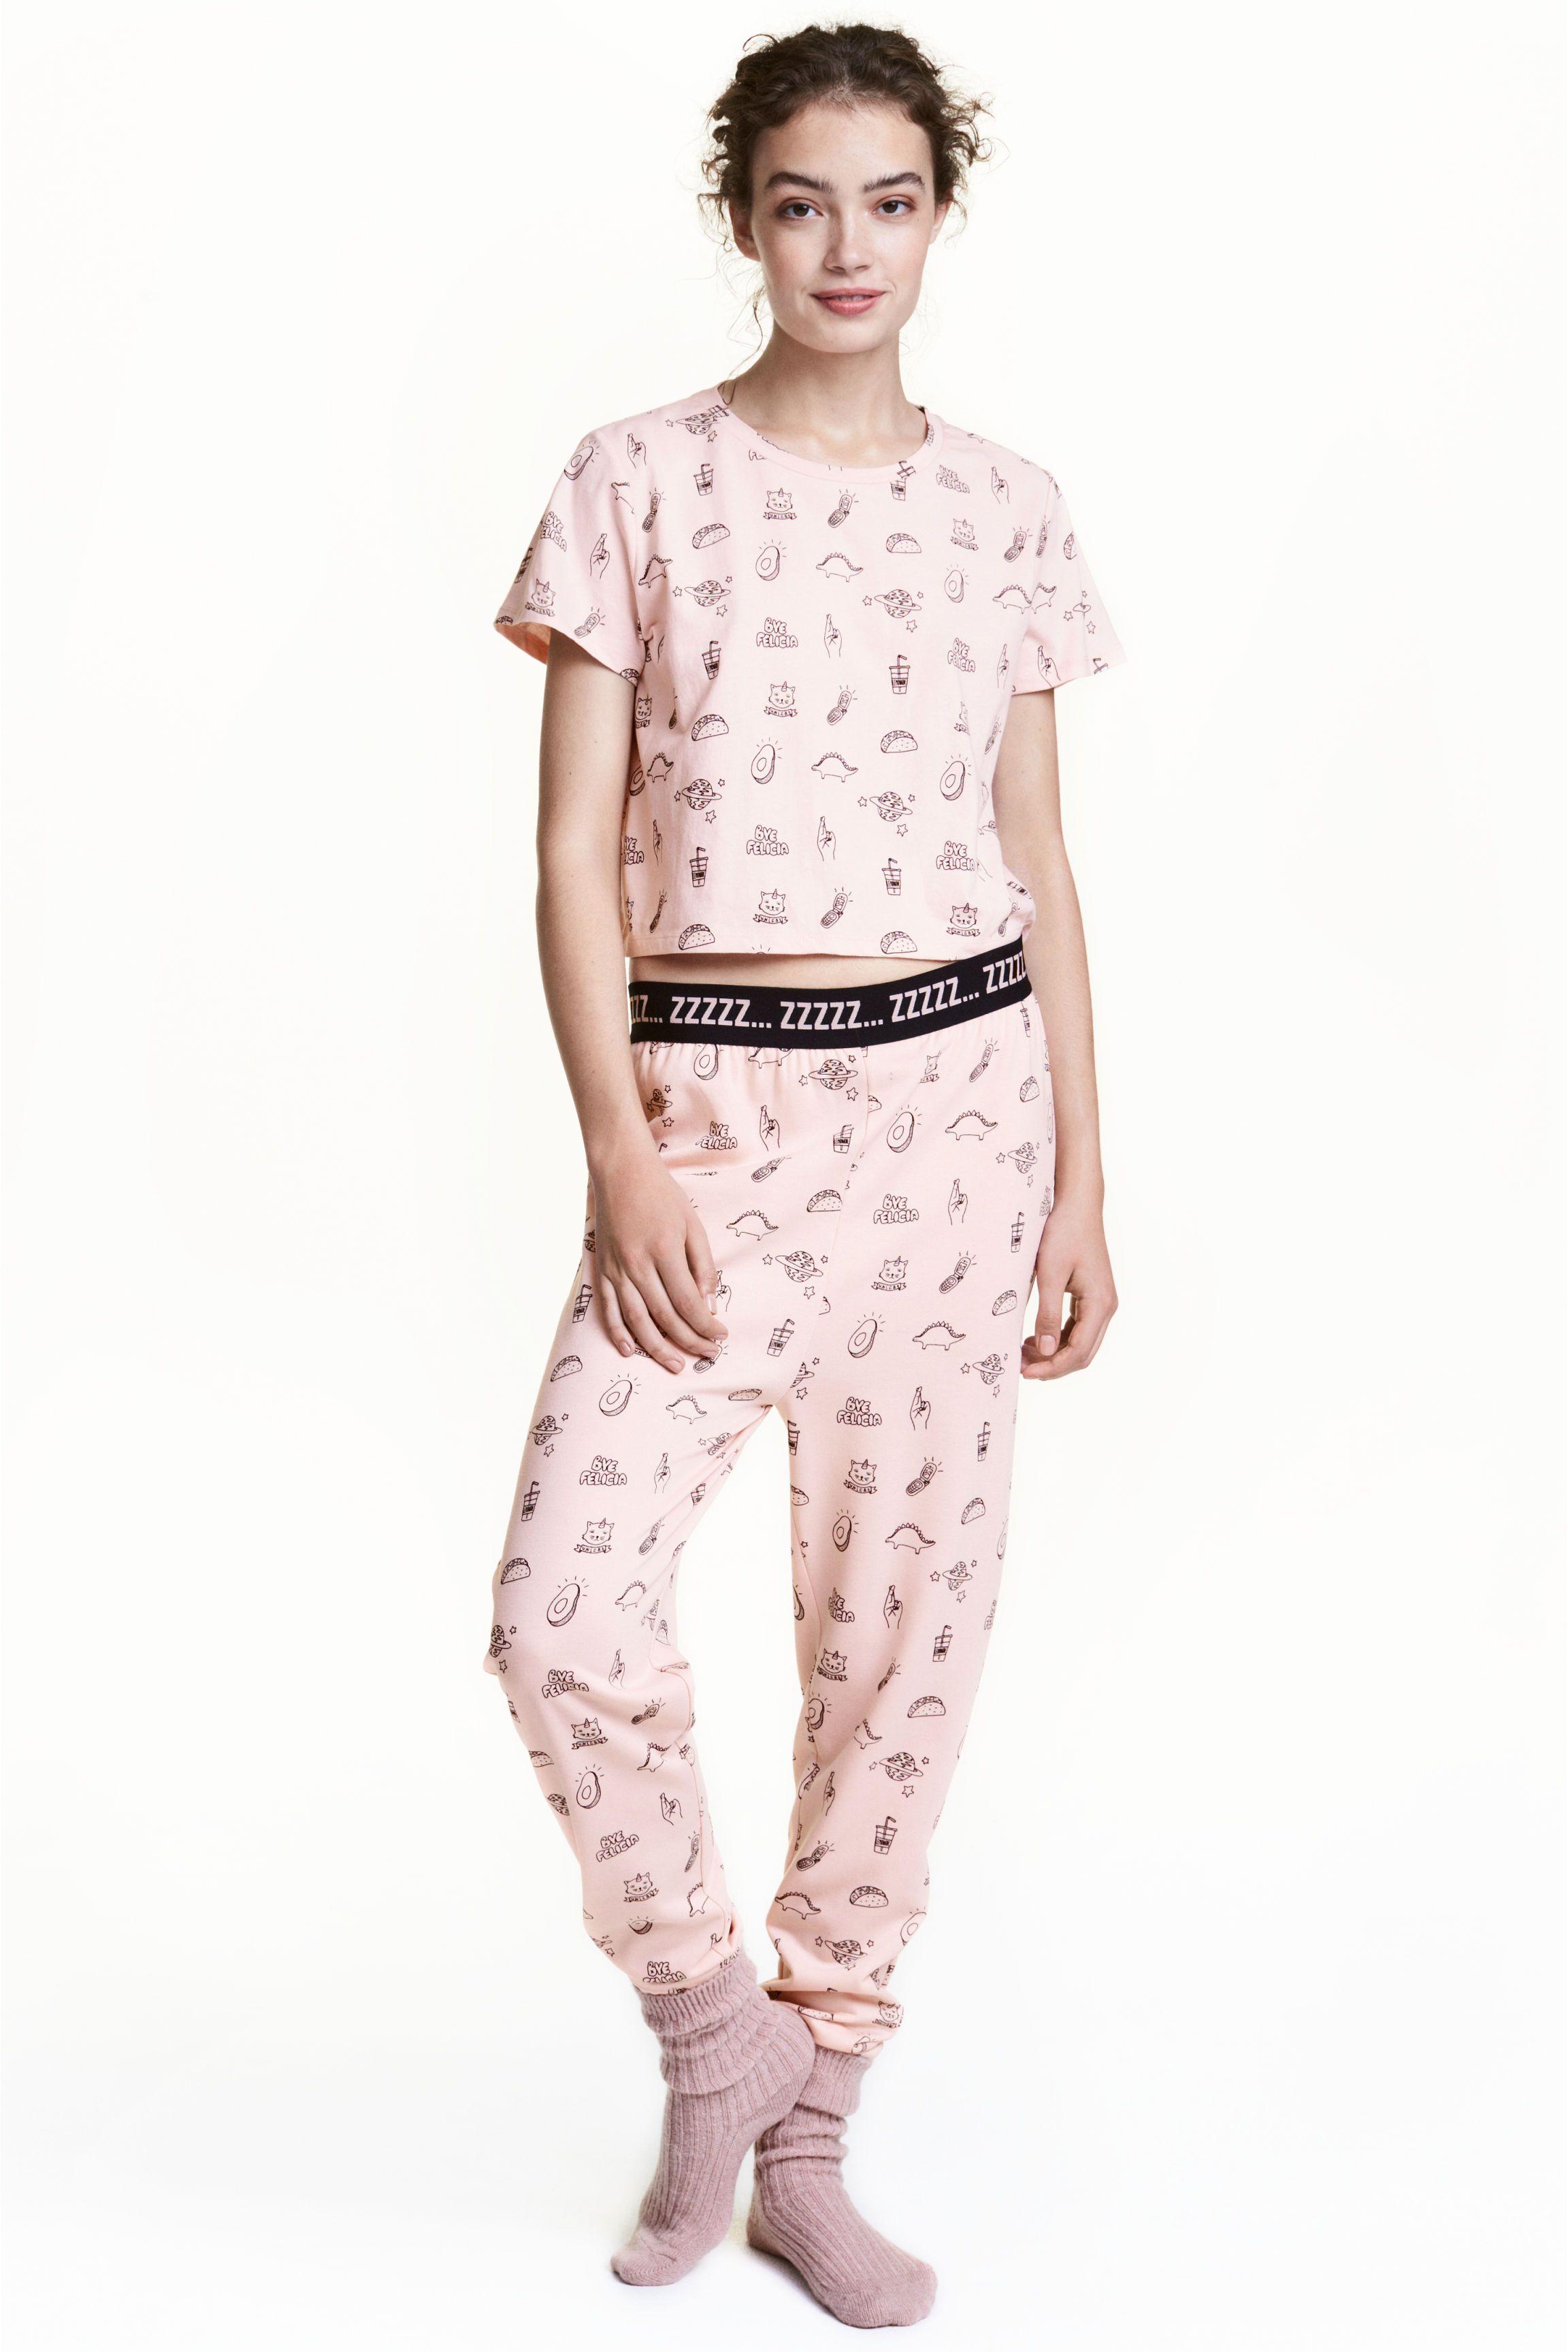 1849386c3eb9fec34fb81b4500396fe0 - Dames Pyjama Met Korte Broek